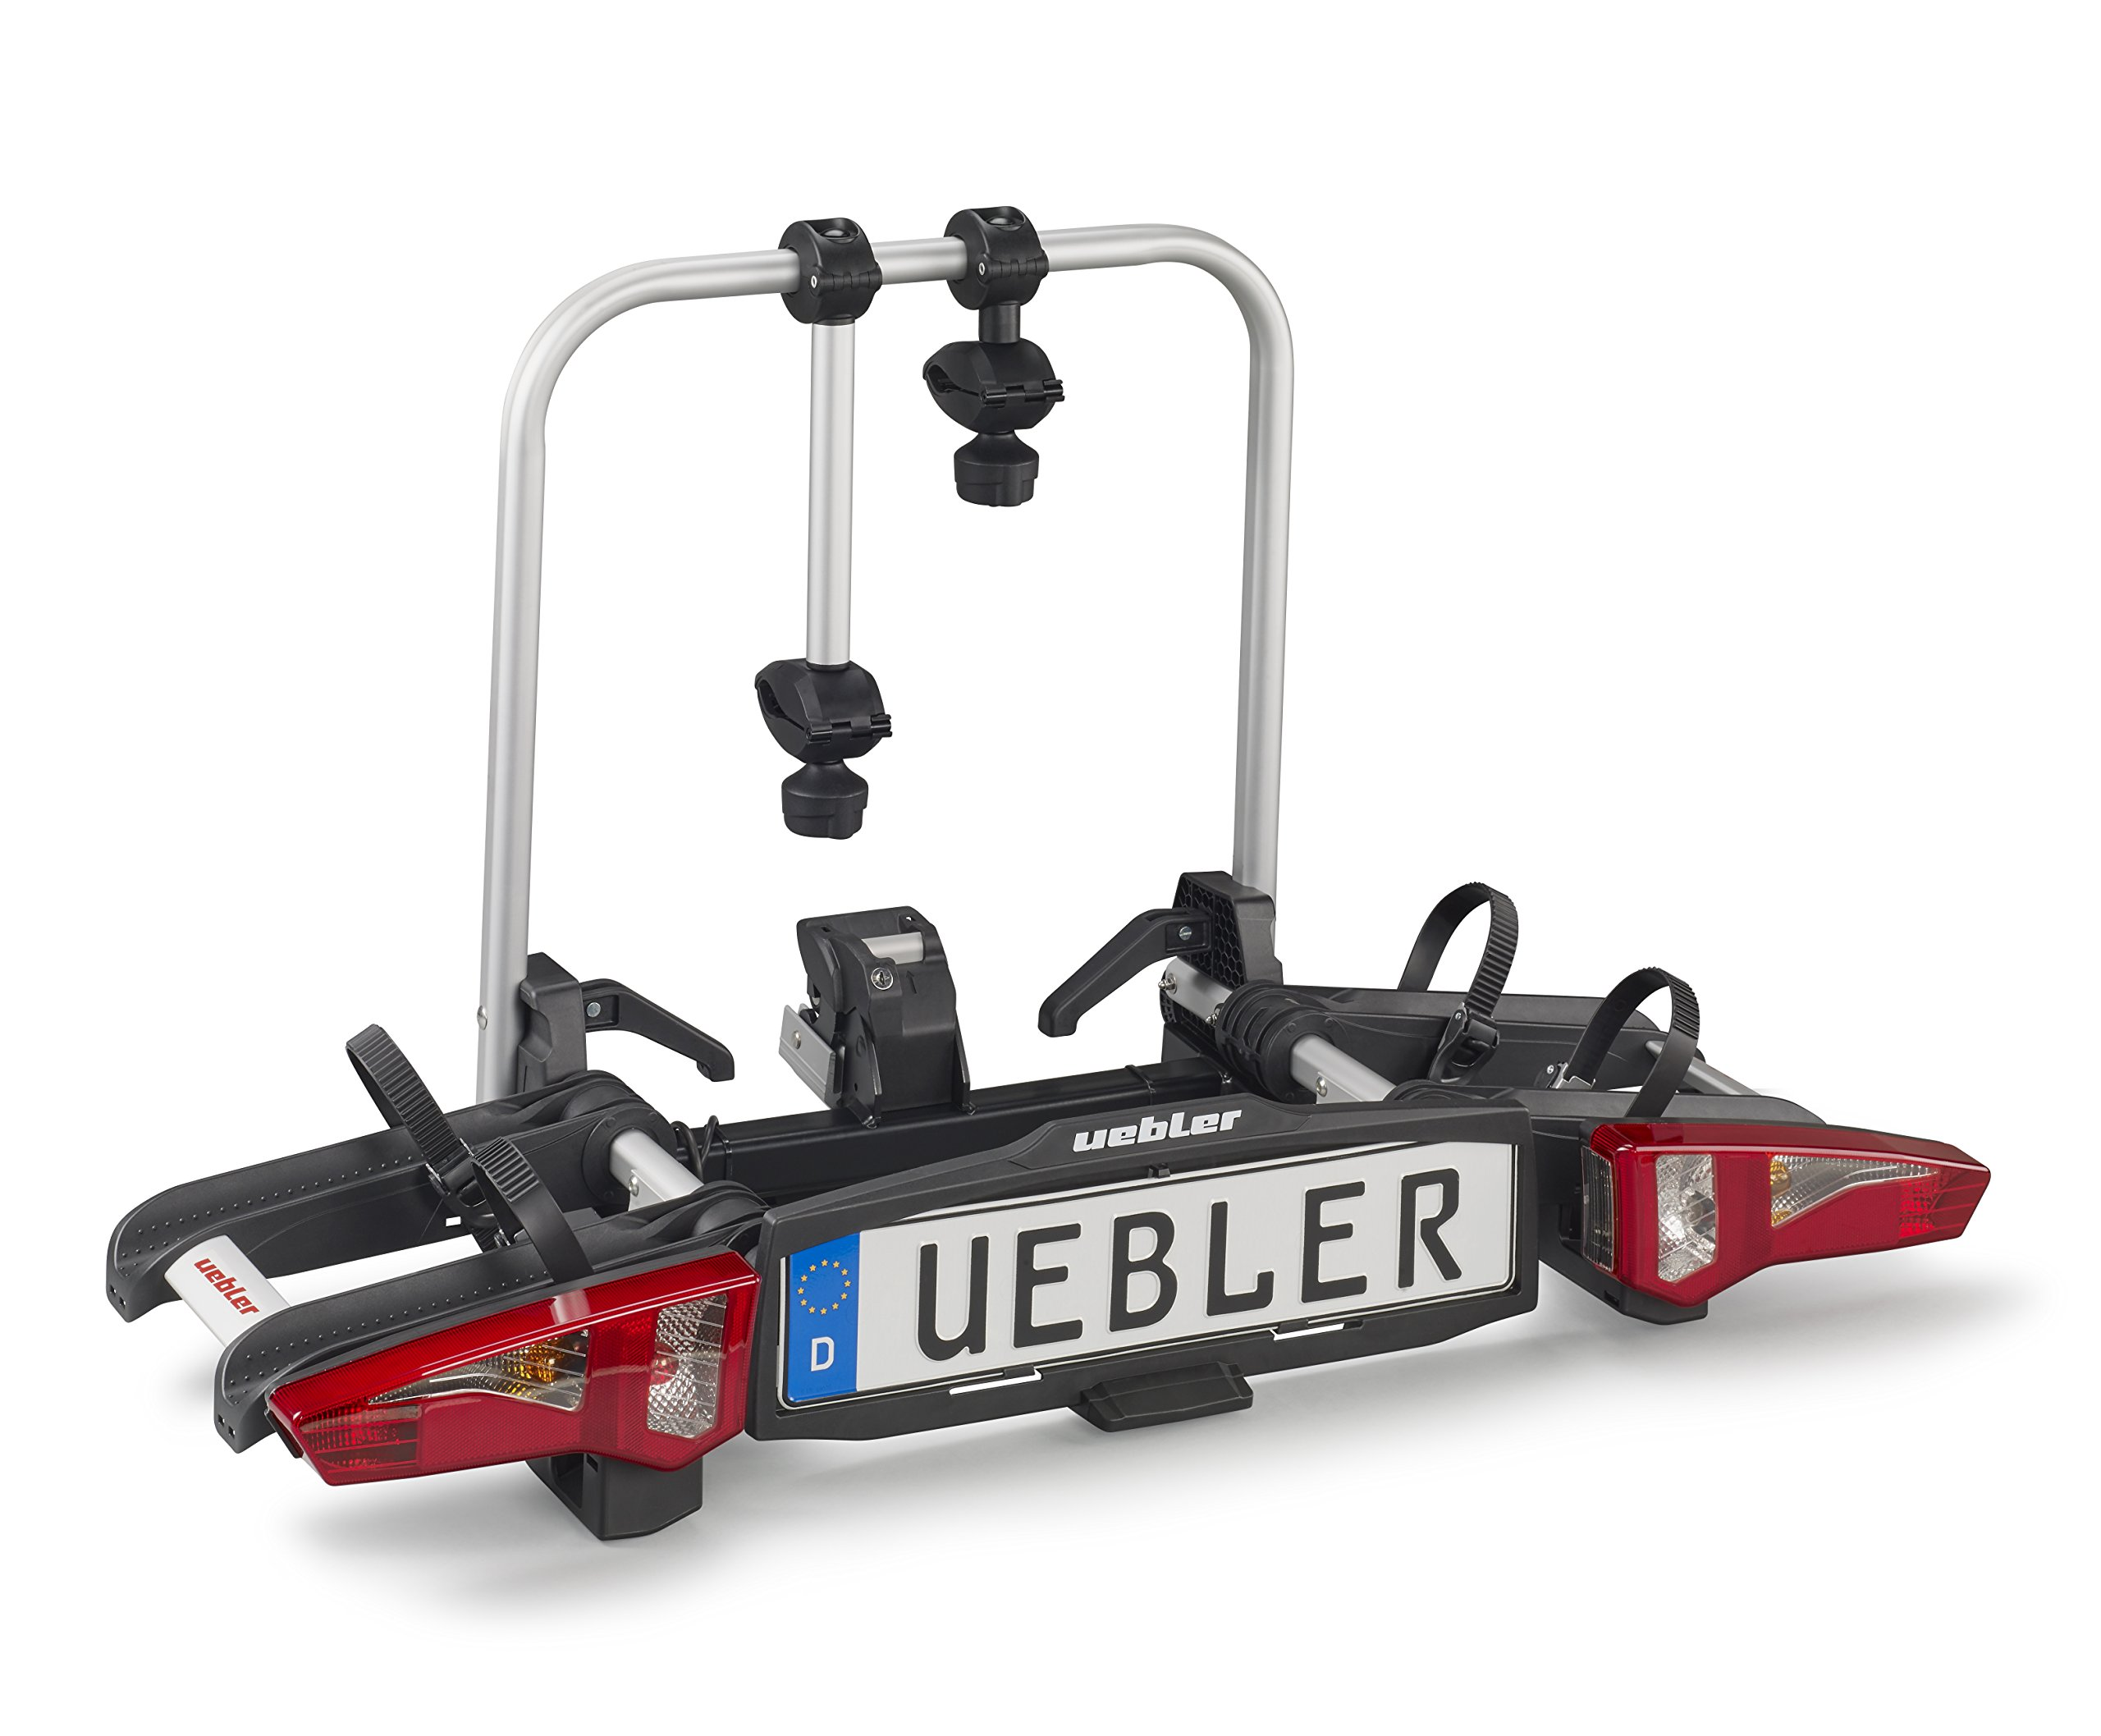 UEBLER Fahrrad Kupplungsträger i21 product image